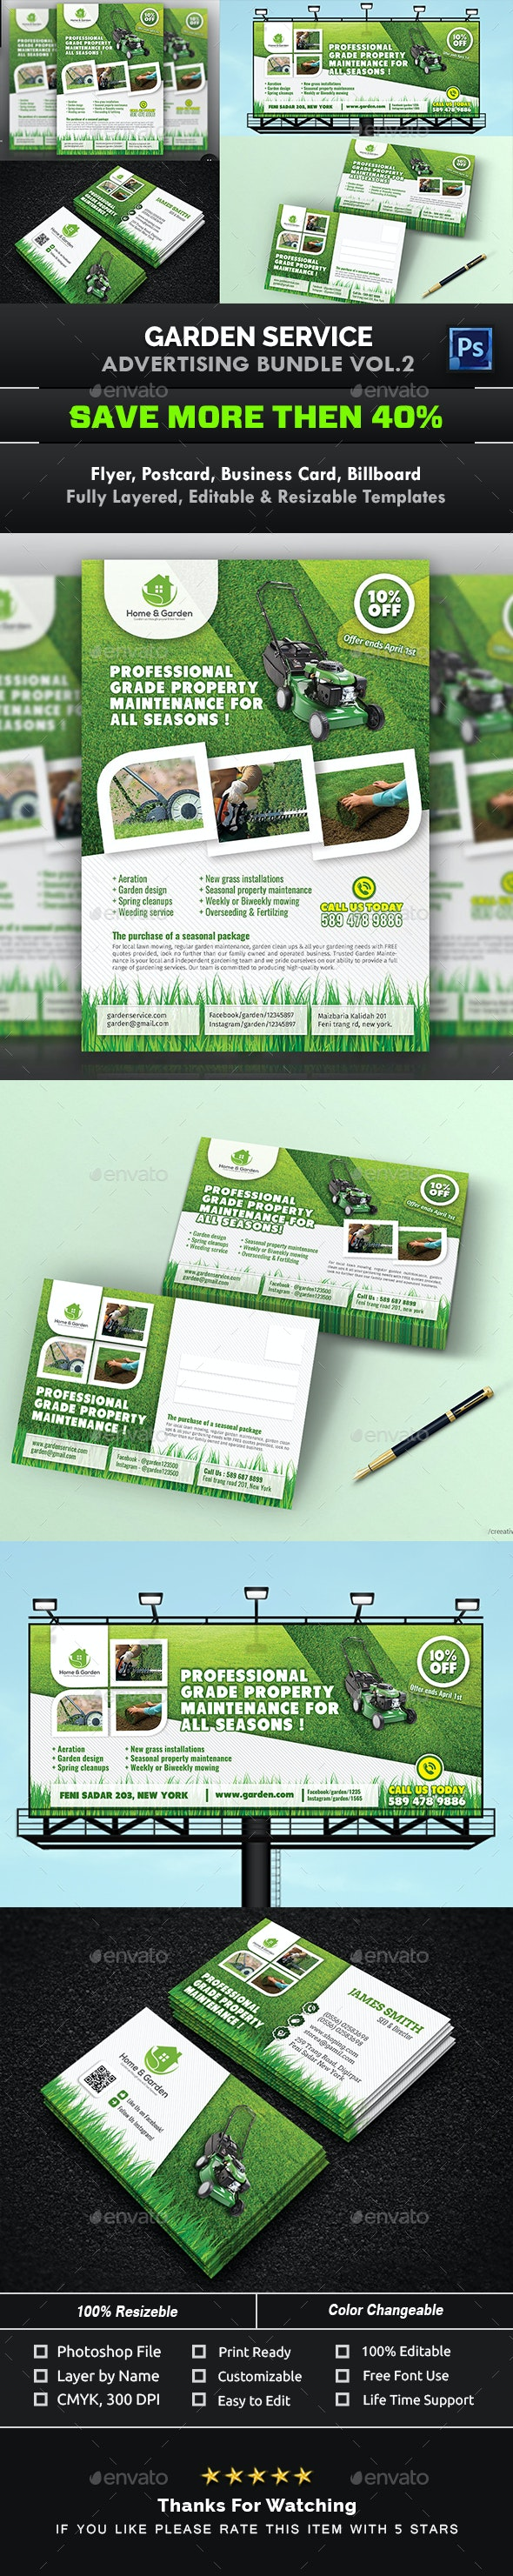 Garden Landscape Advertising Bundle Vol.2 - Signage Print Templates